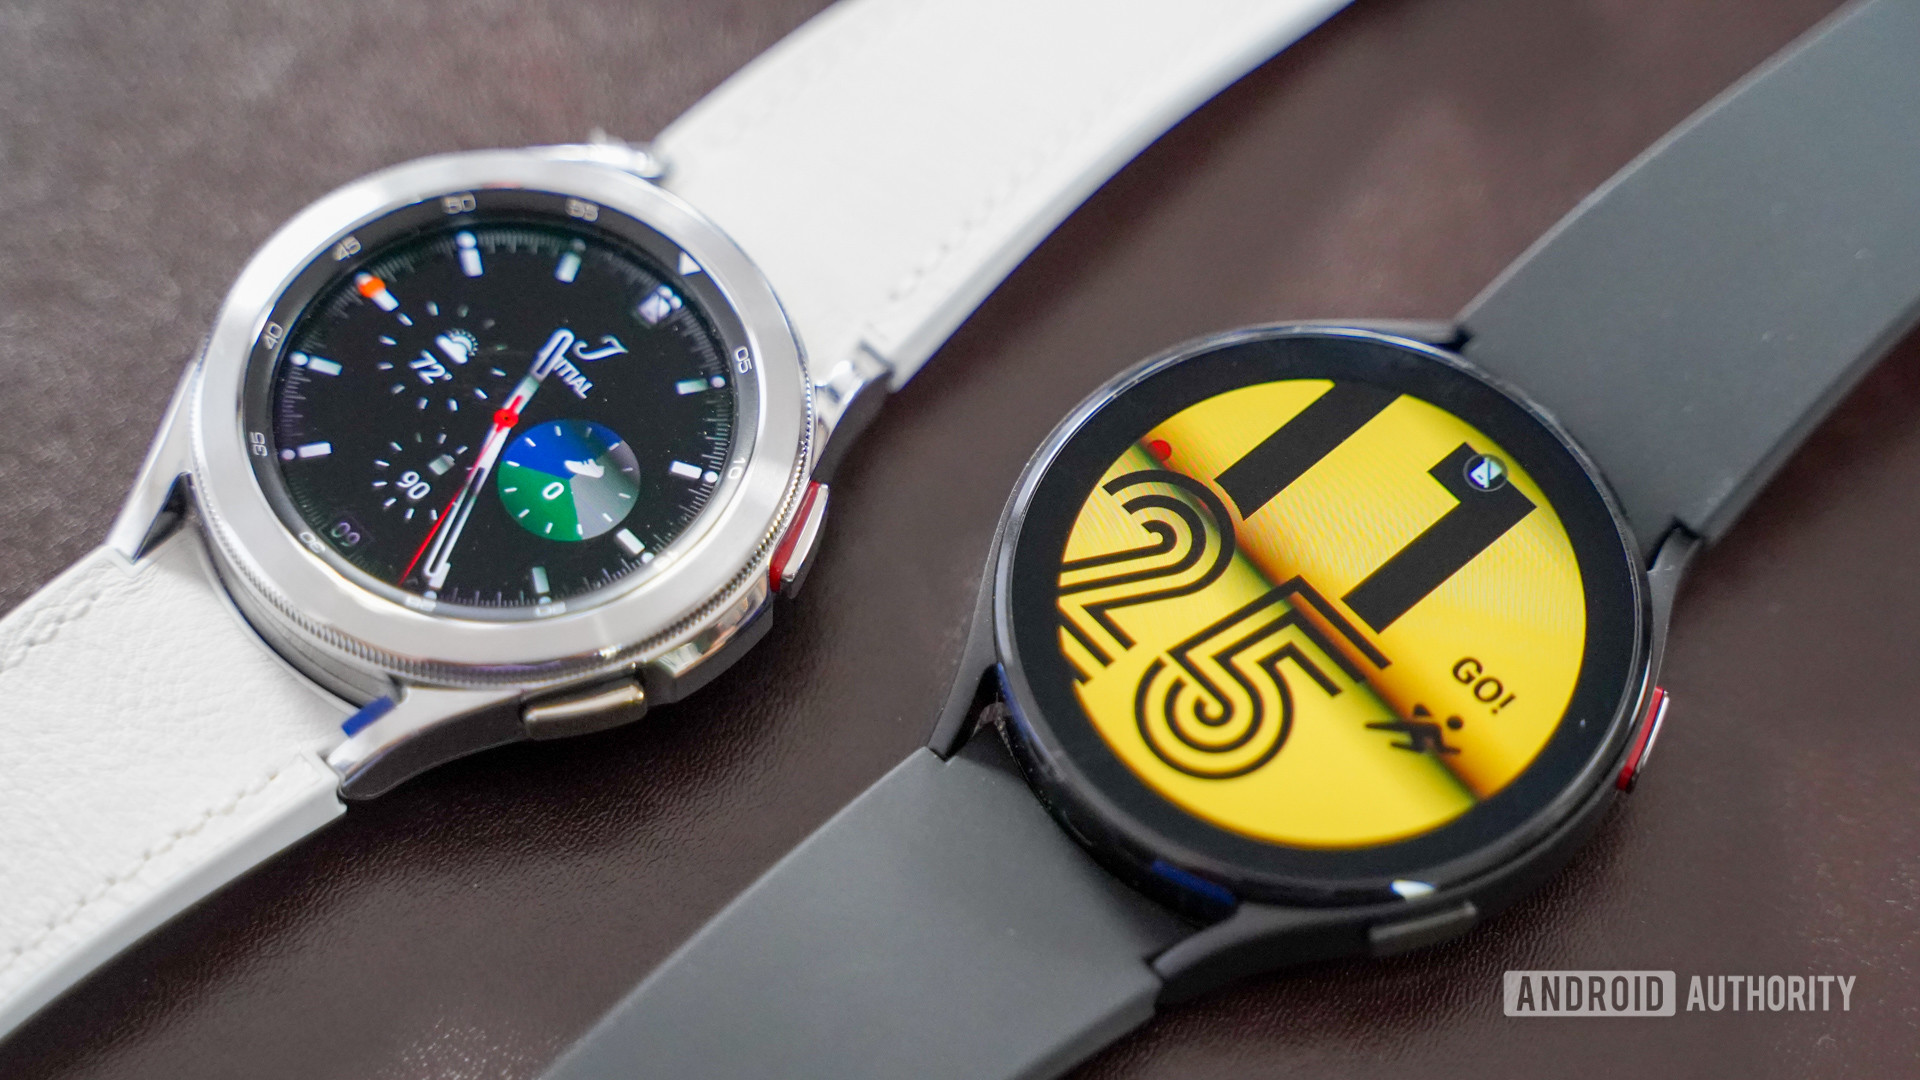 Samsung Galaxy Watch 4 Classic with Watch 4